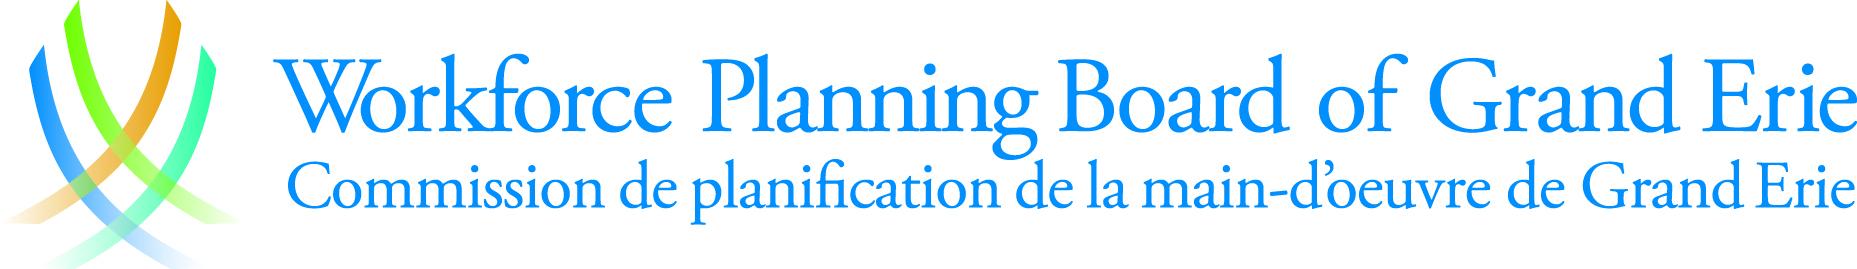 Workforce Planning Board of Grand Erie